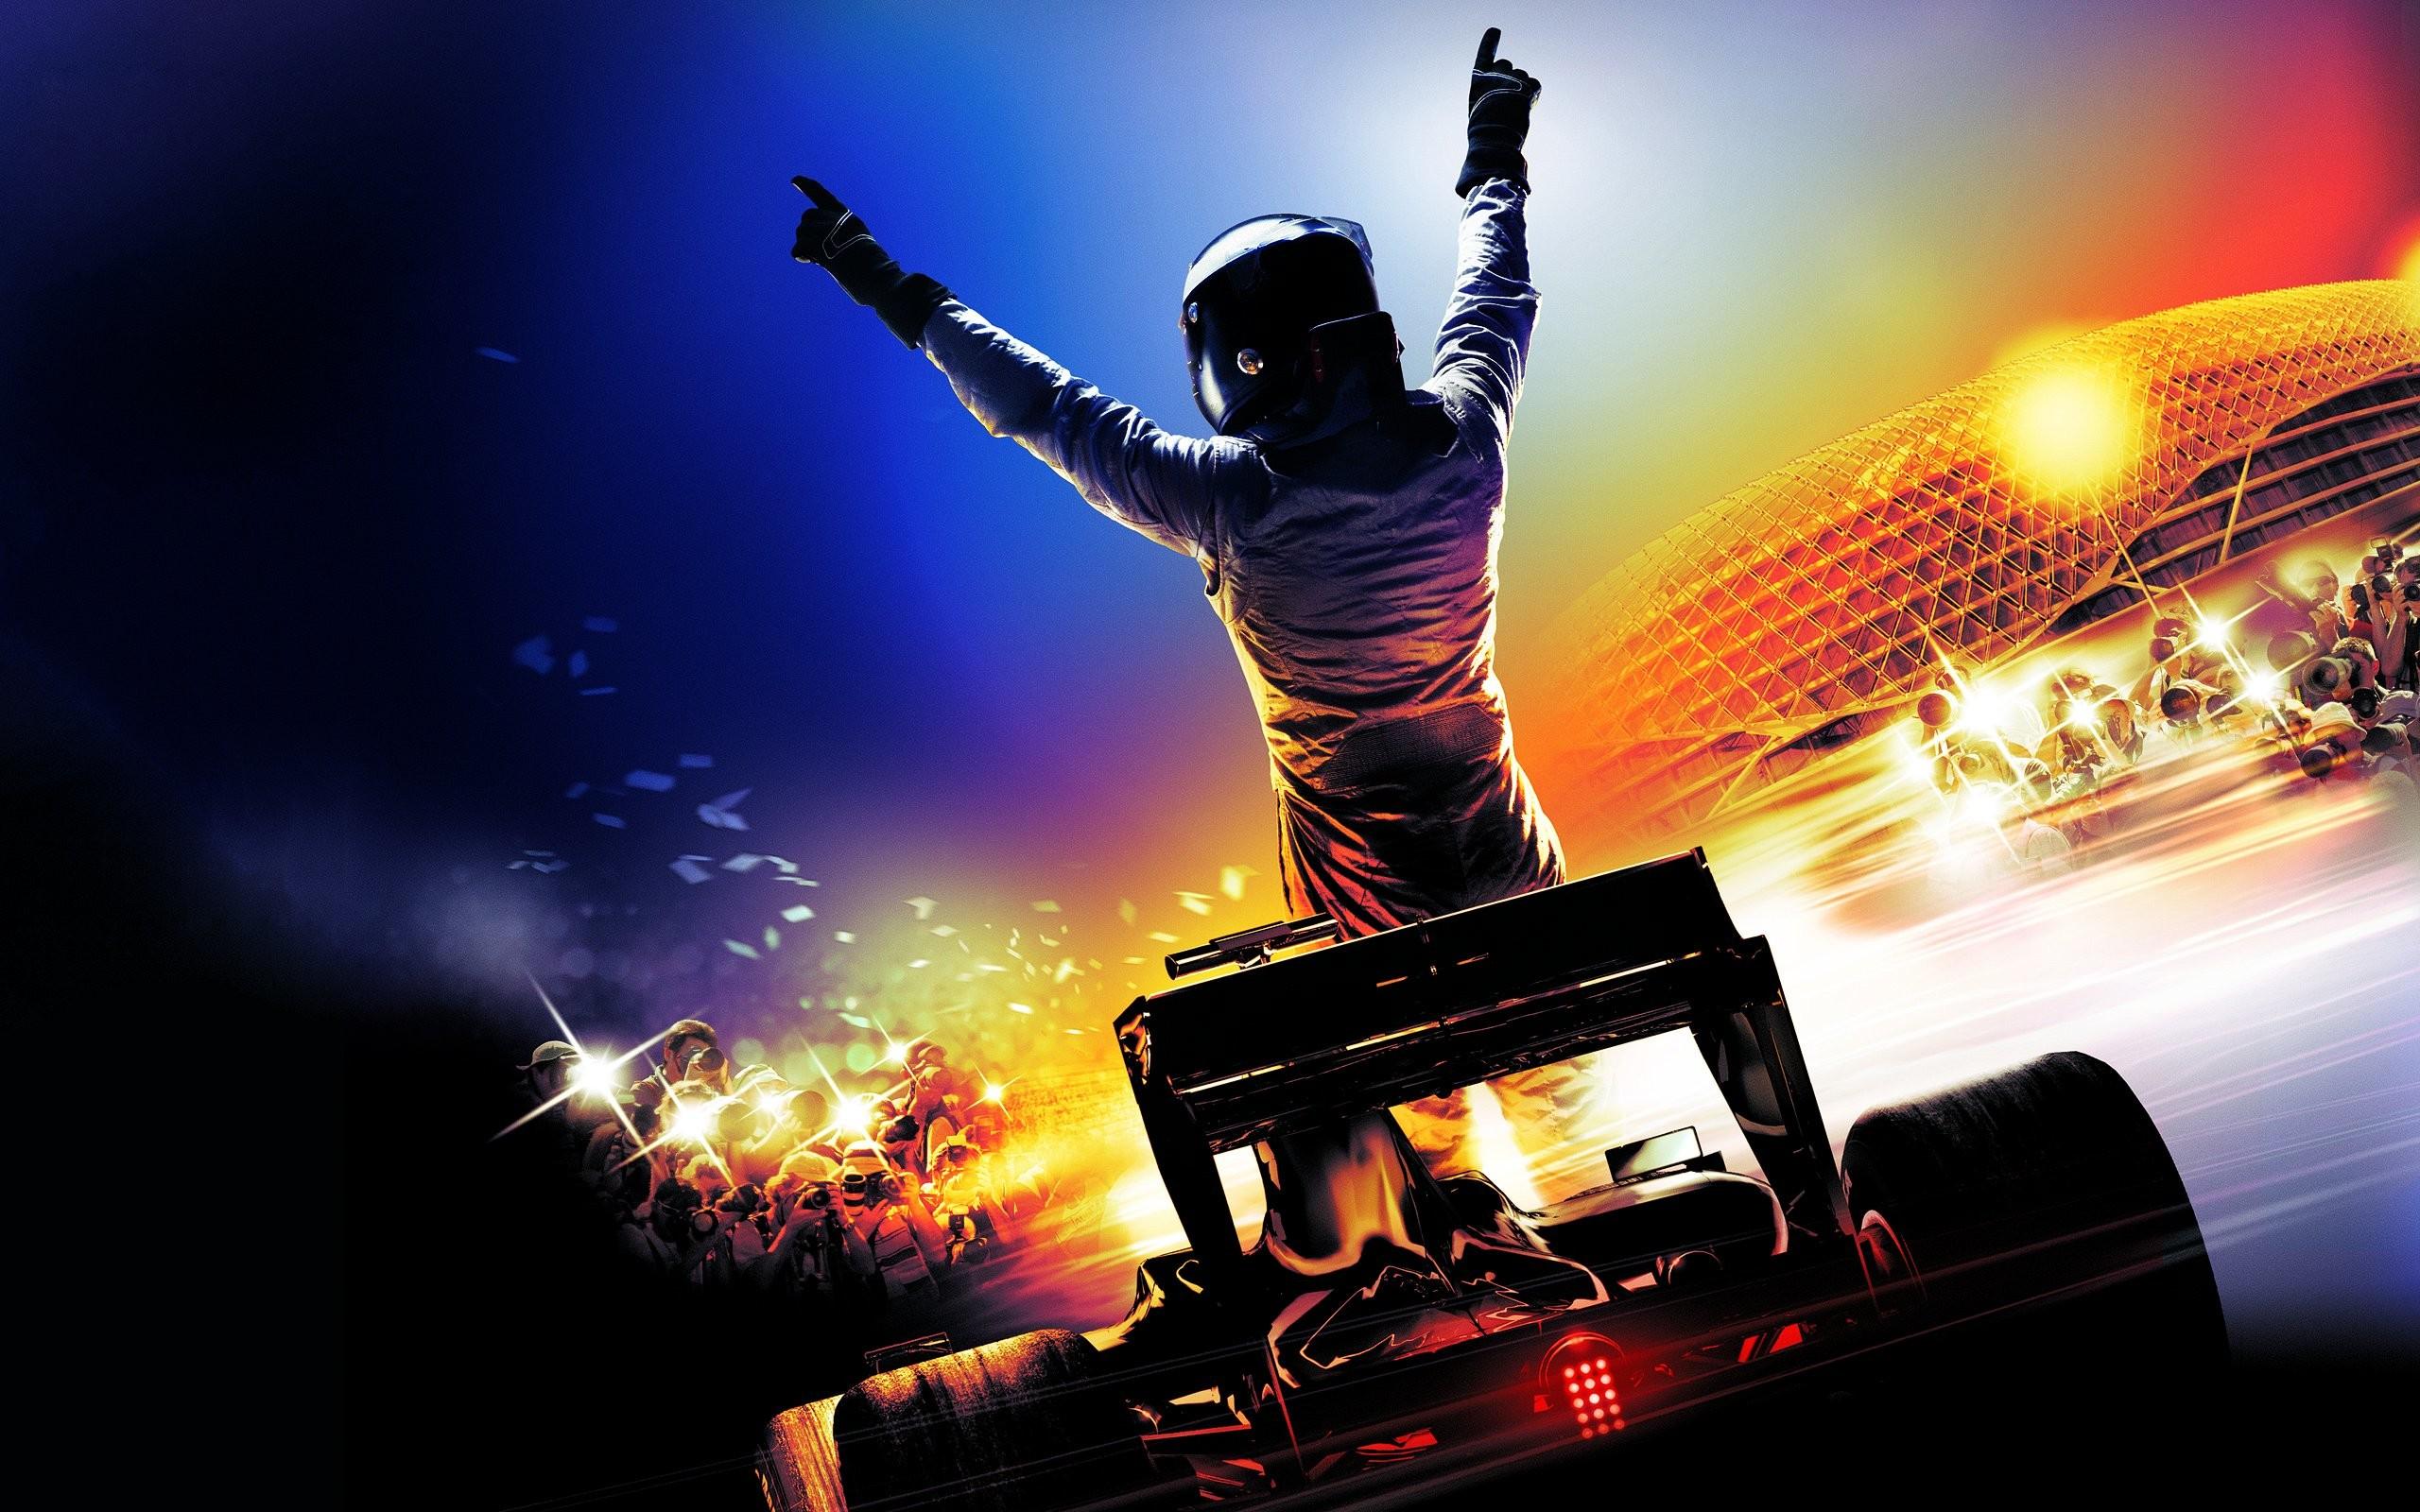 F1 2010 (PC) – Games Wallpaper Desktop-Hintergründe gratis